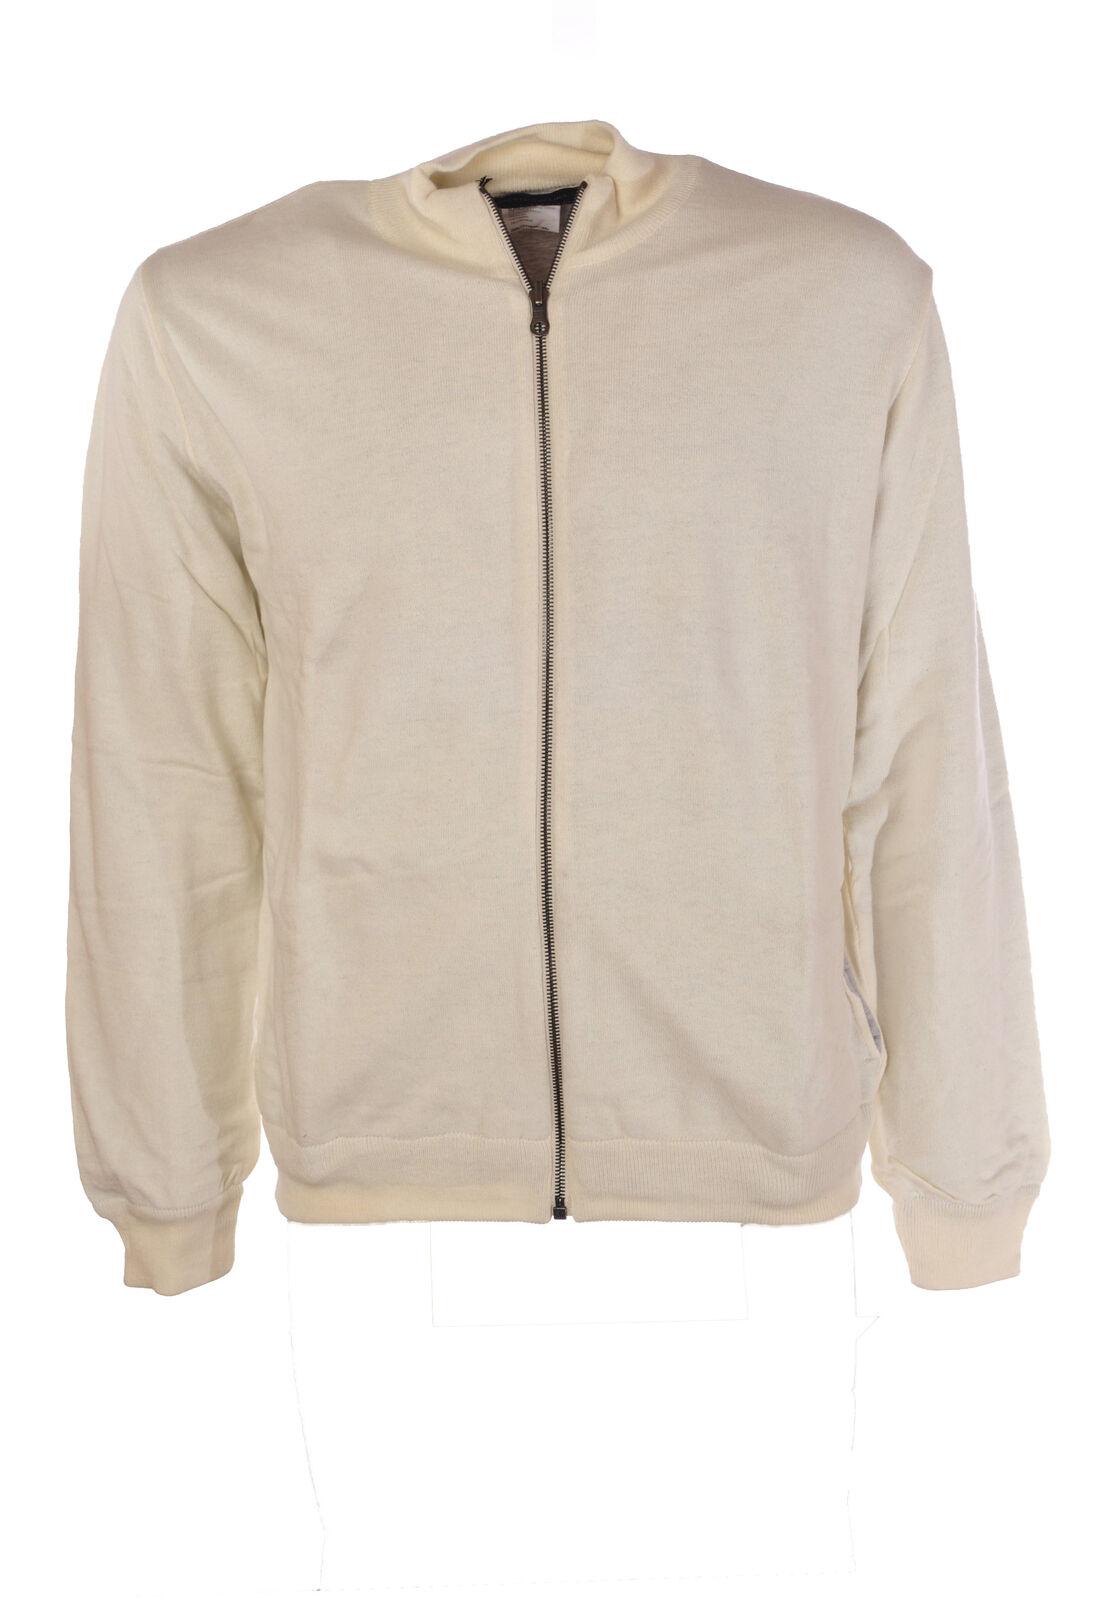 Roberto Collina  -  Sweaters - Male - White - 2785330N173607